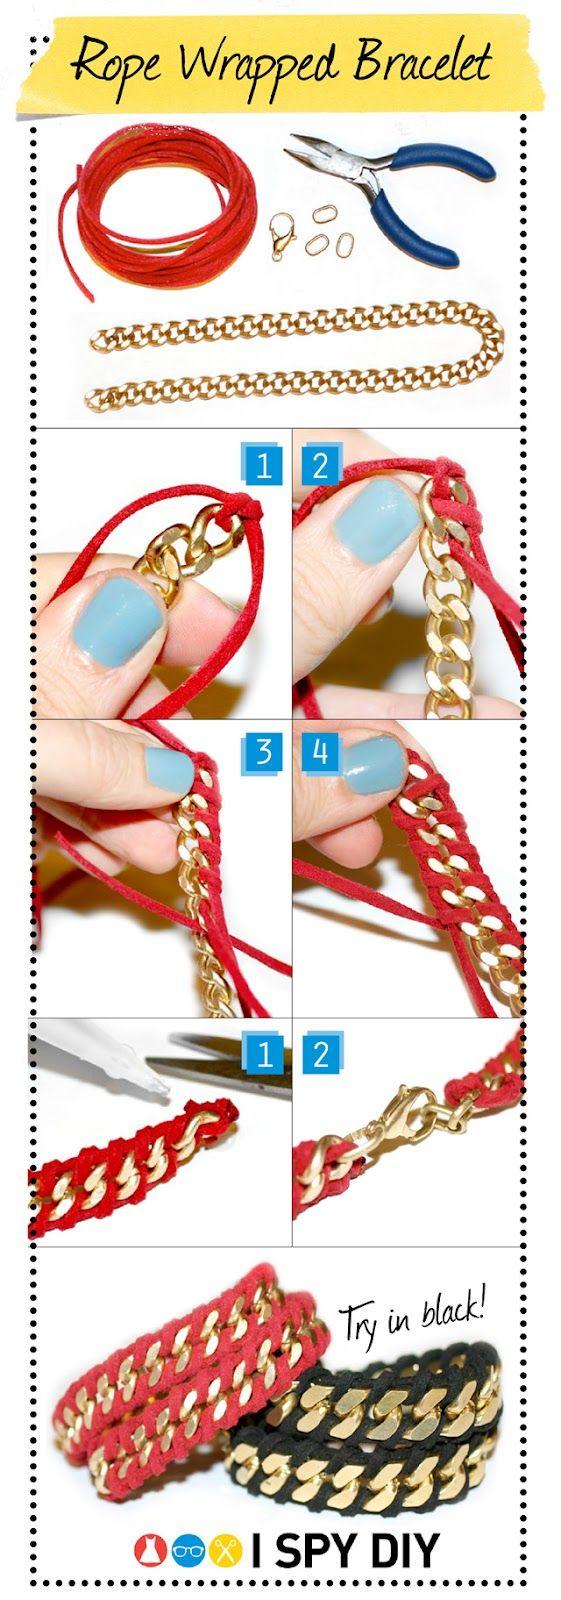 DIY绳包裹链手链